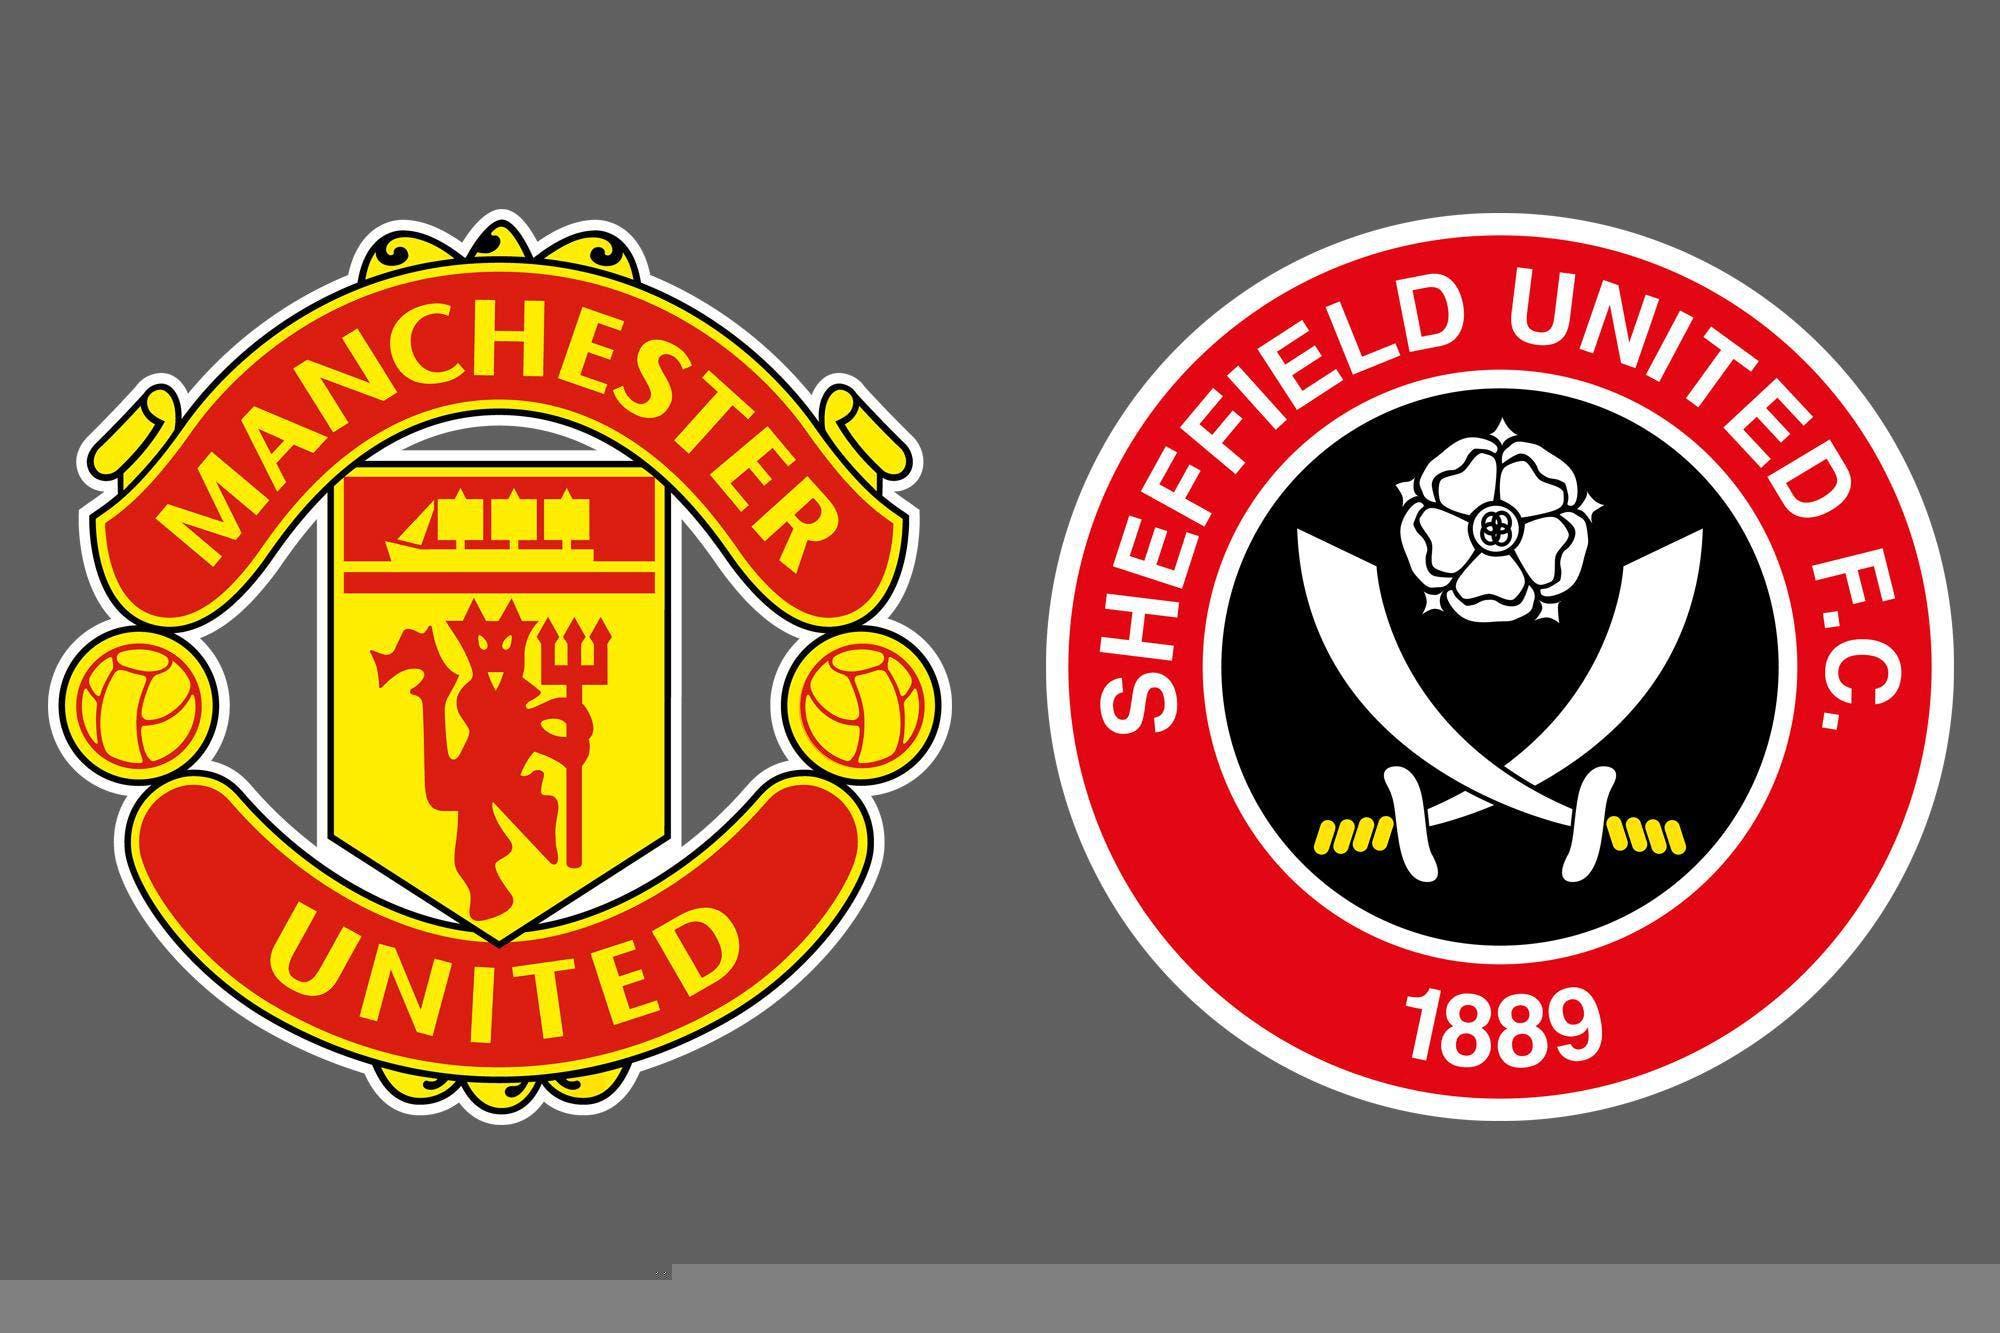 Premier League de Inglaterra: Sheffield United venció por 2-1 a Manchester United como visitante